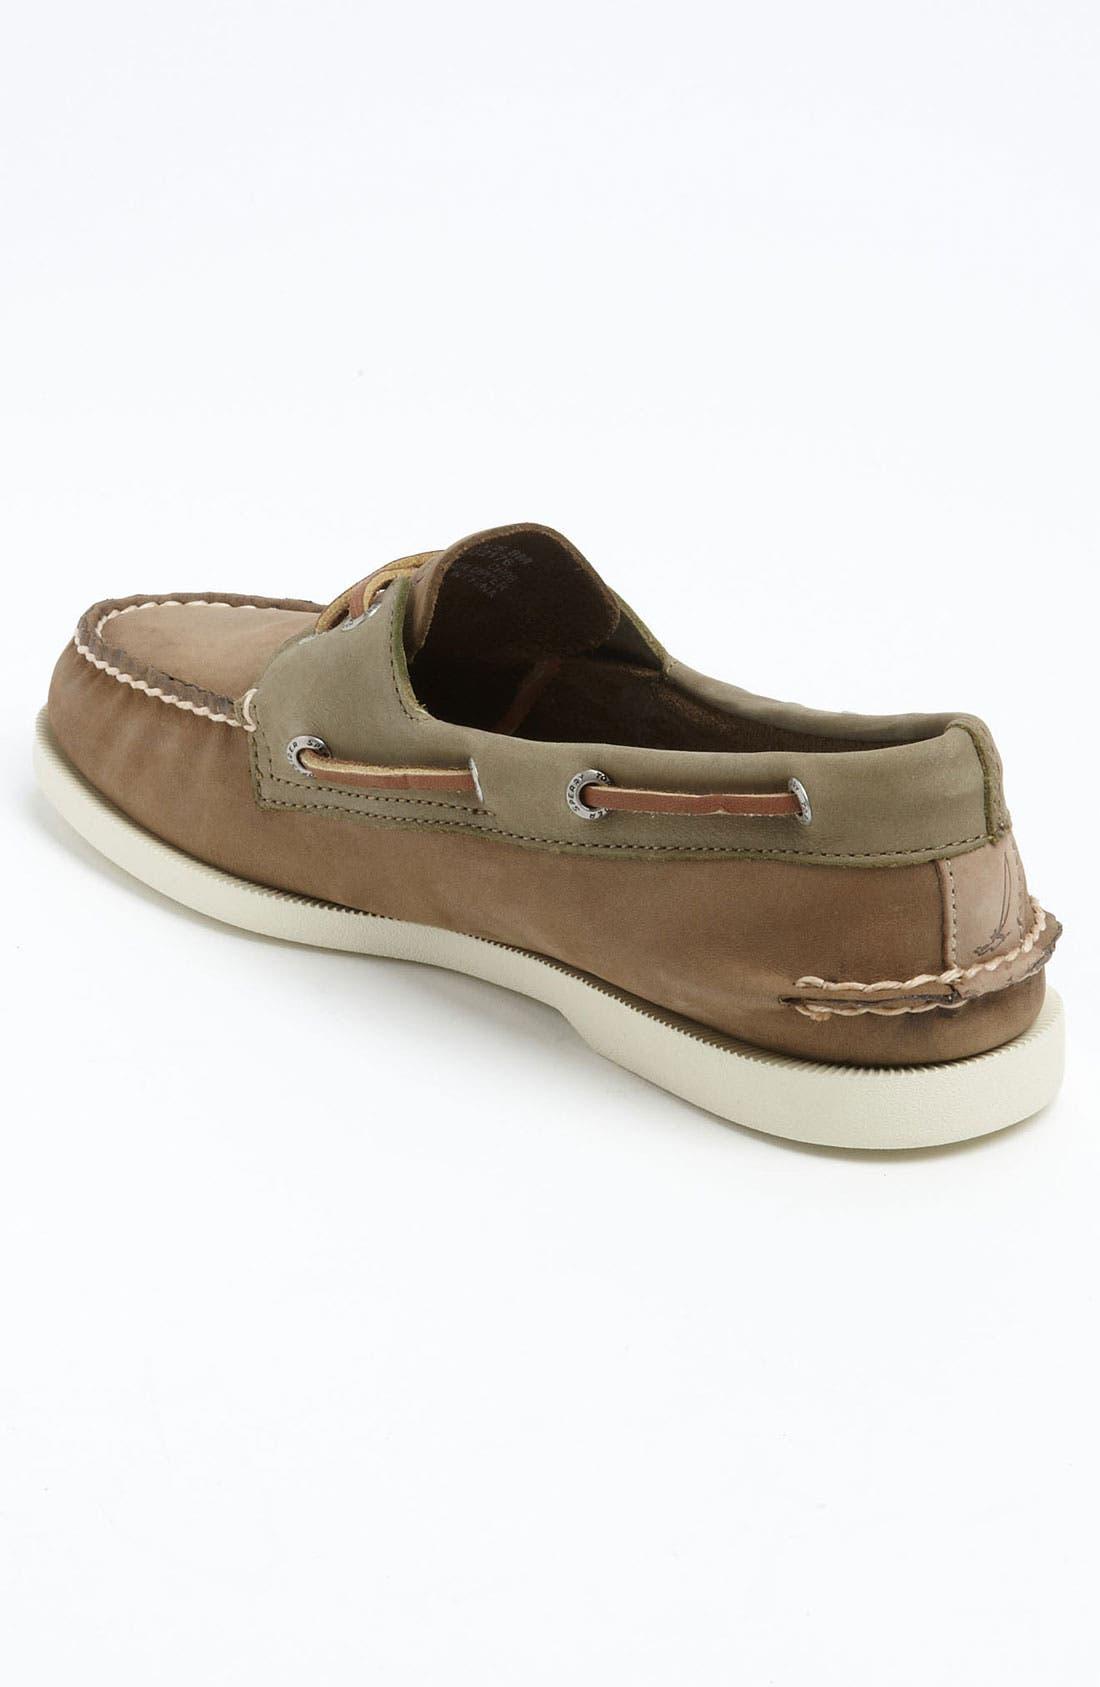 Alternate Image 2  - Sperry Top-Sider® 'Authentic Original' Boat Shoe (Men) (Online Exclusive)